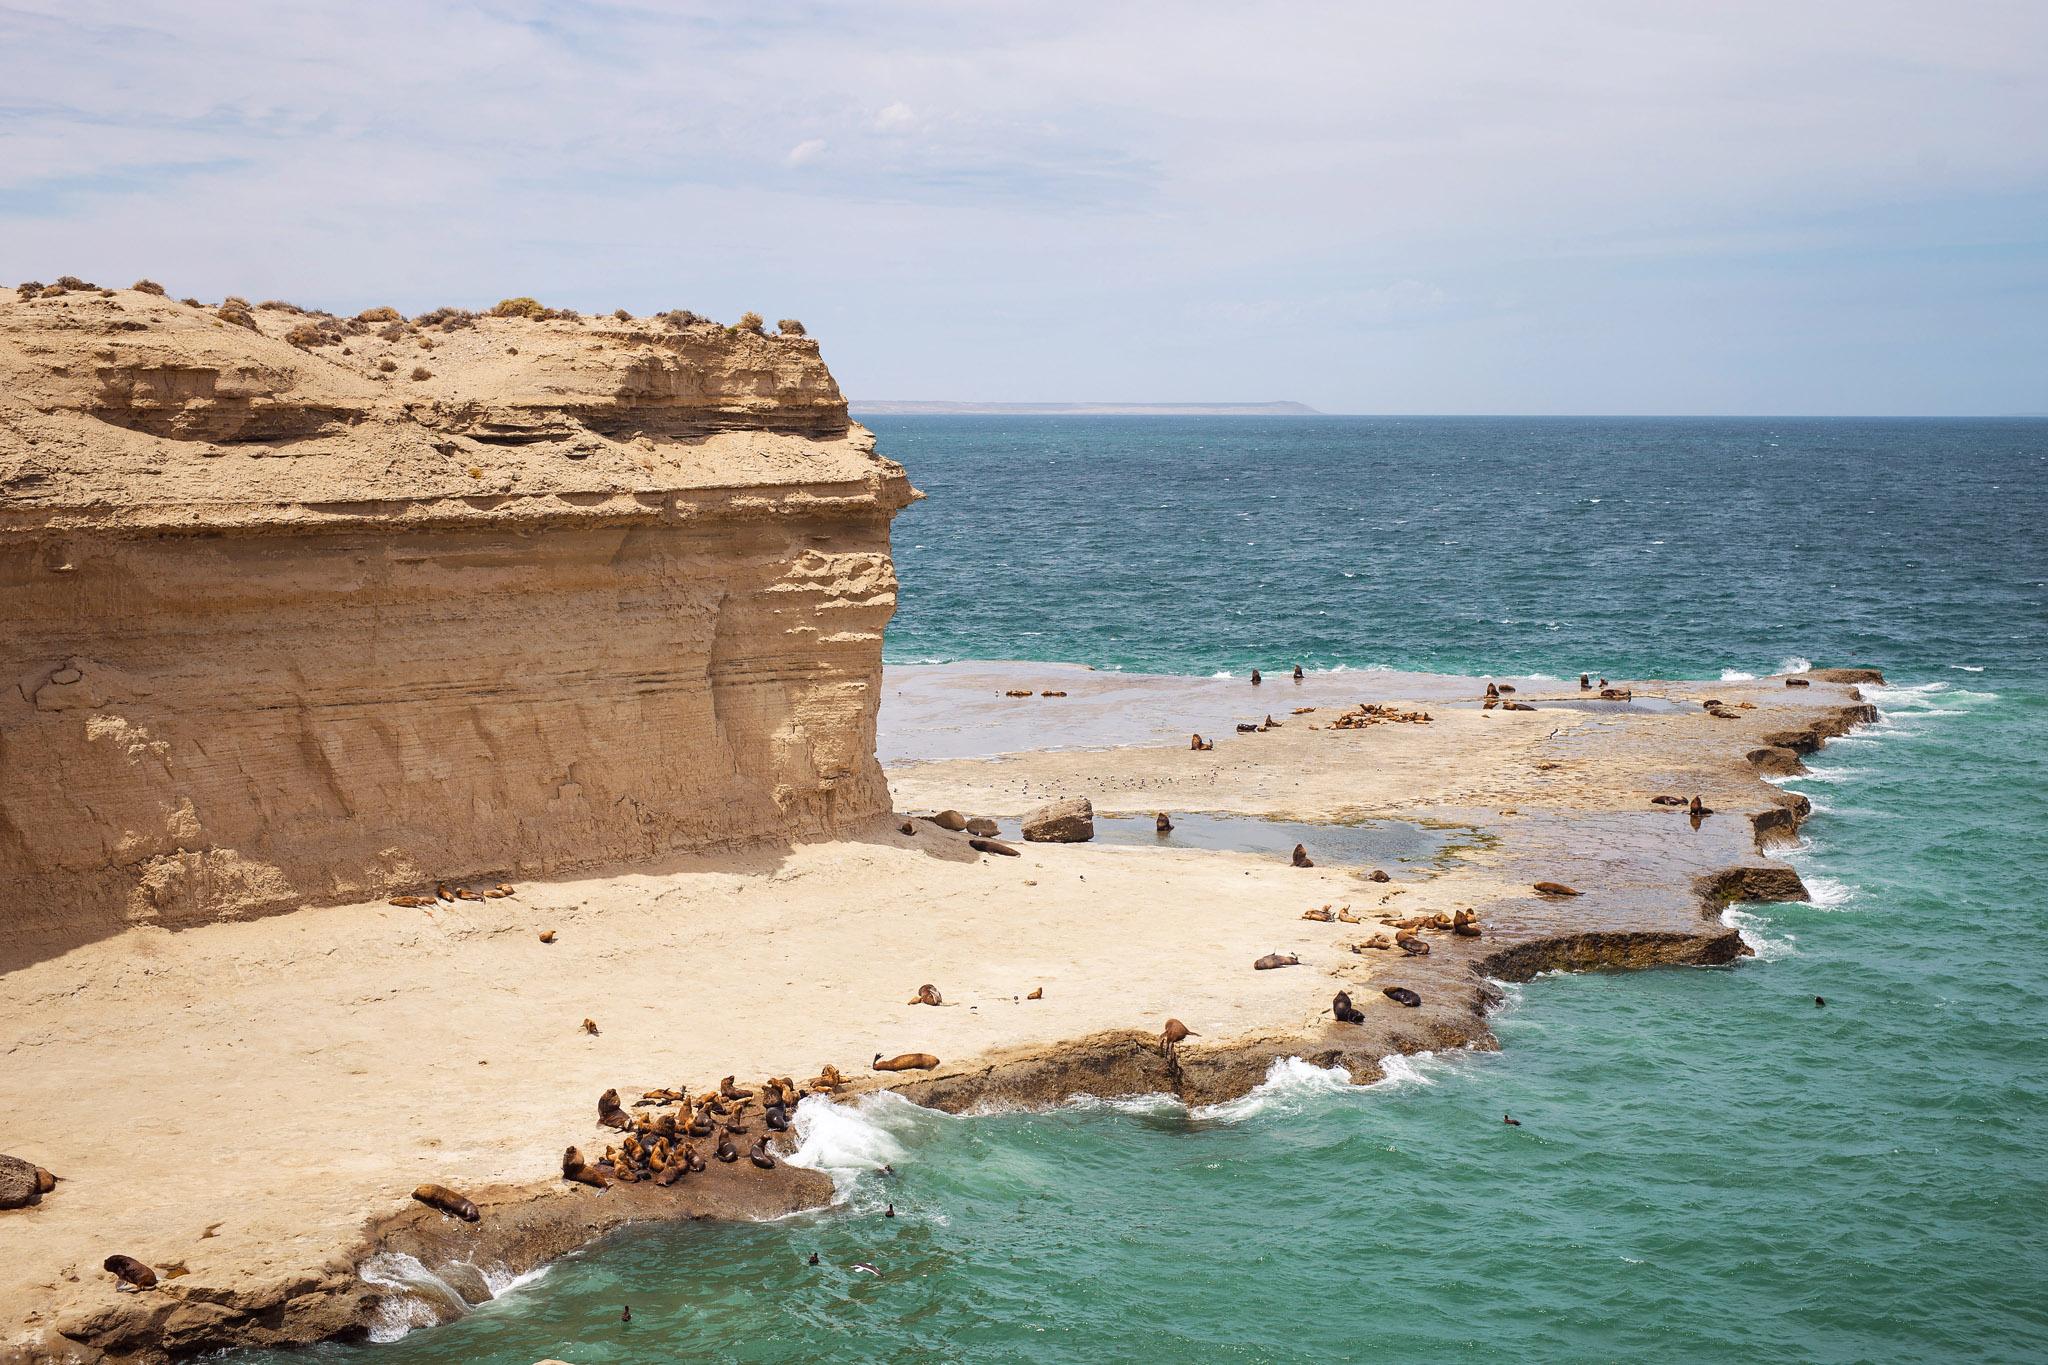 wedding-travellers-argentina-peninsula-valdes-sea-lion-shore-cliff